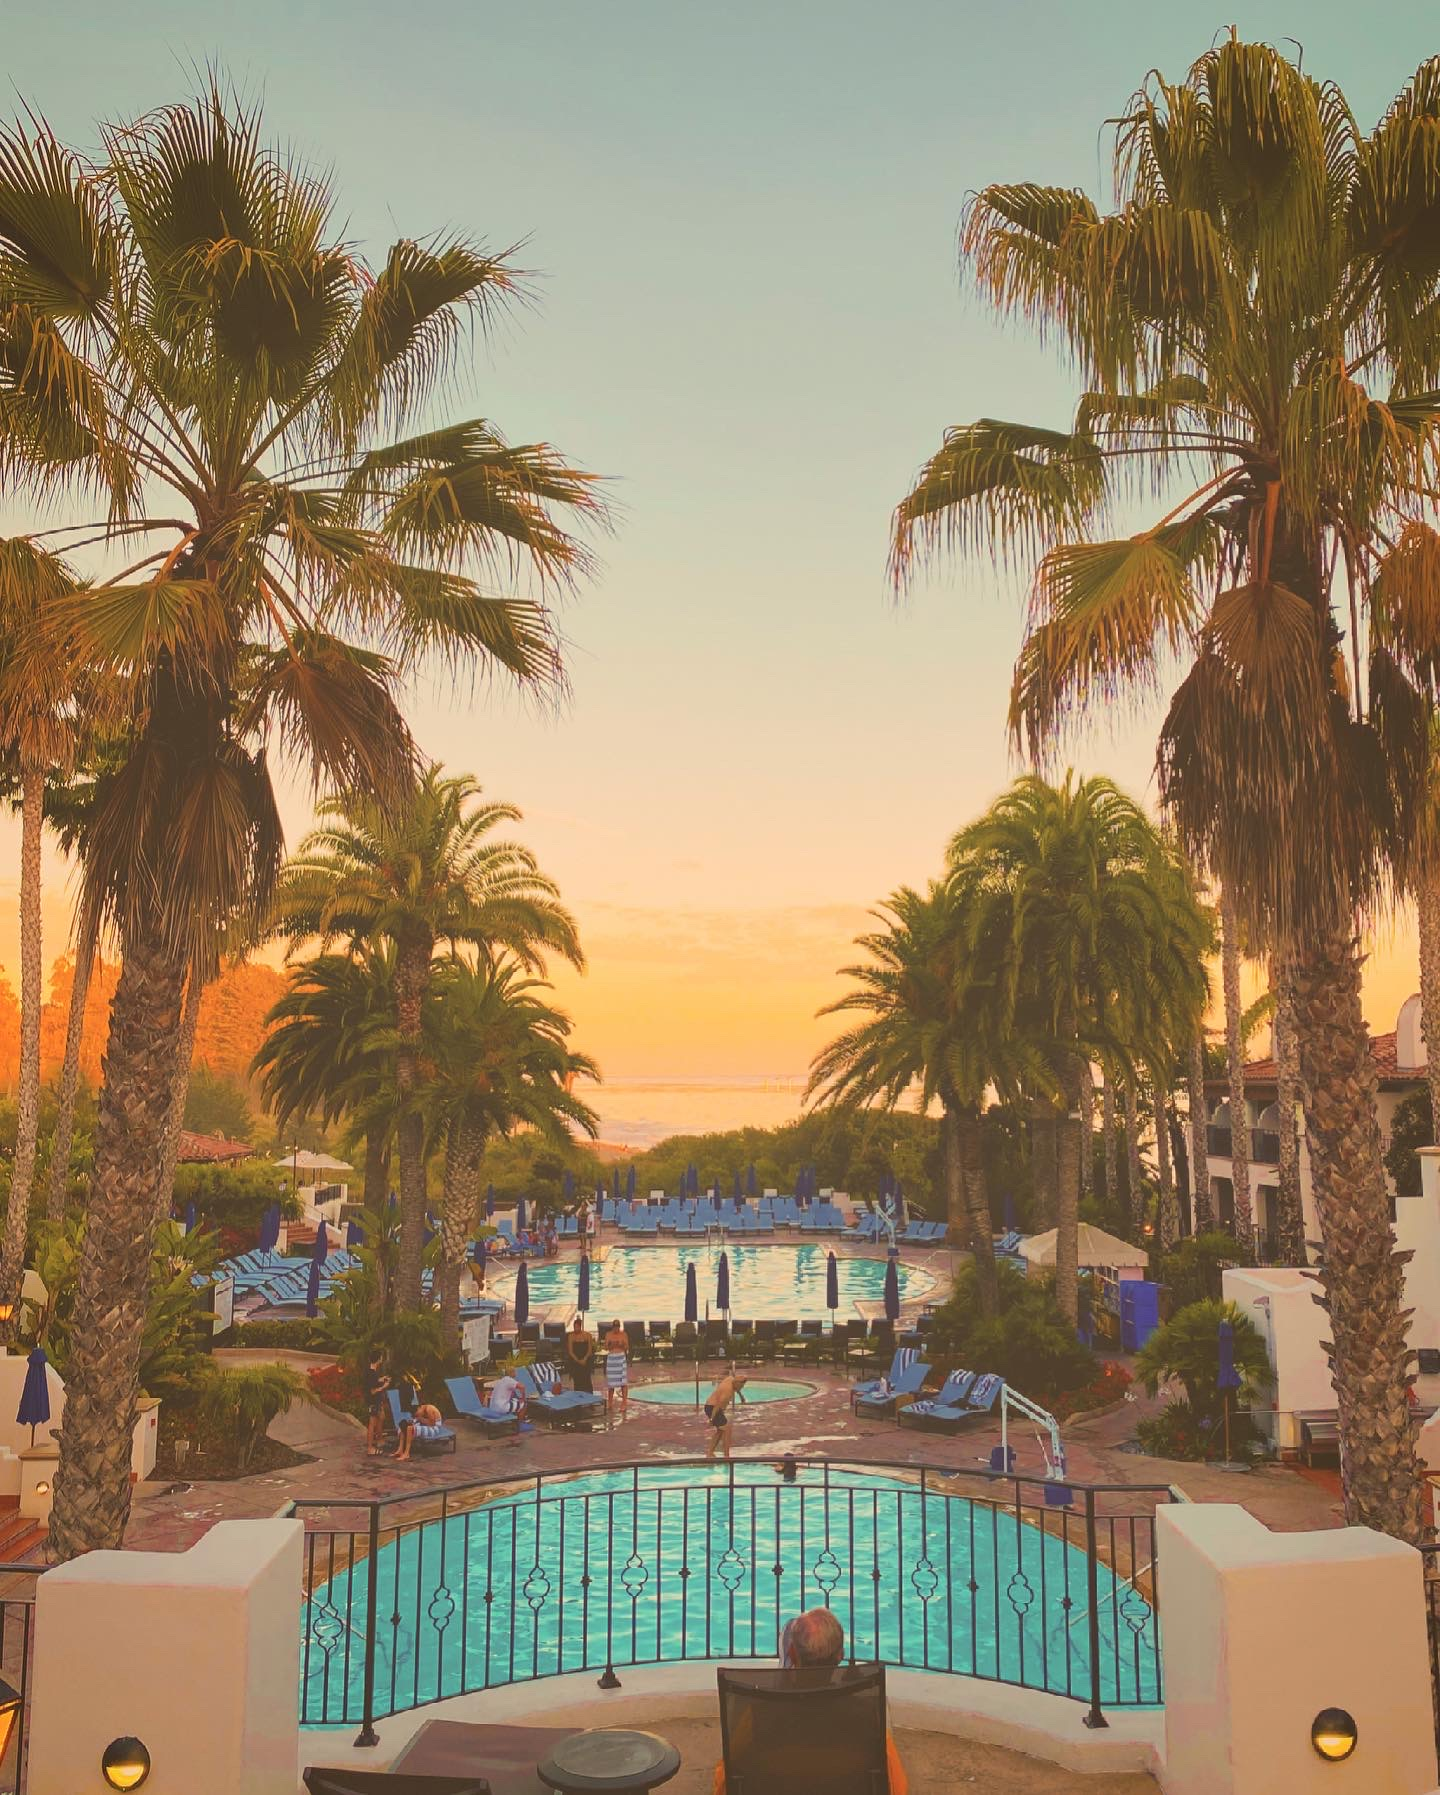 baccarat Santa Barbara pool at sunset